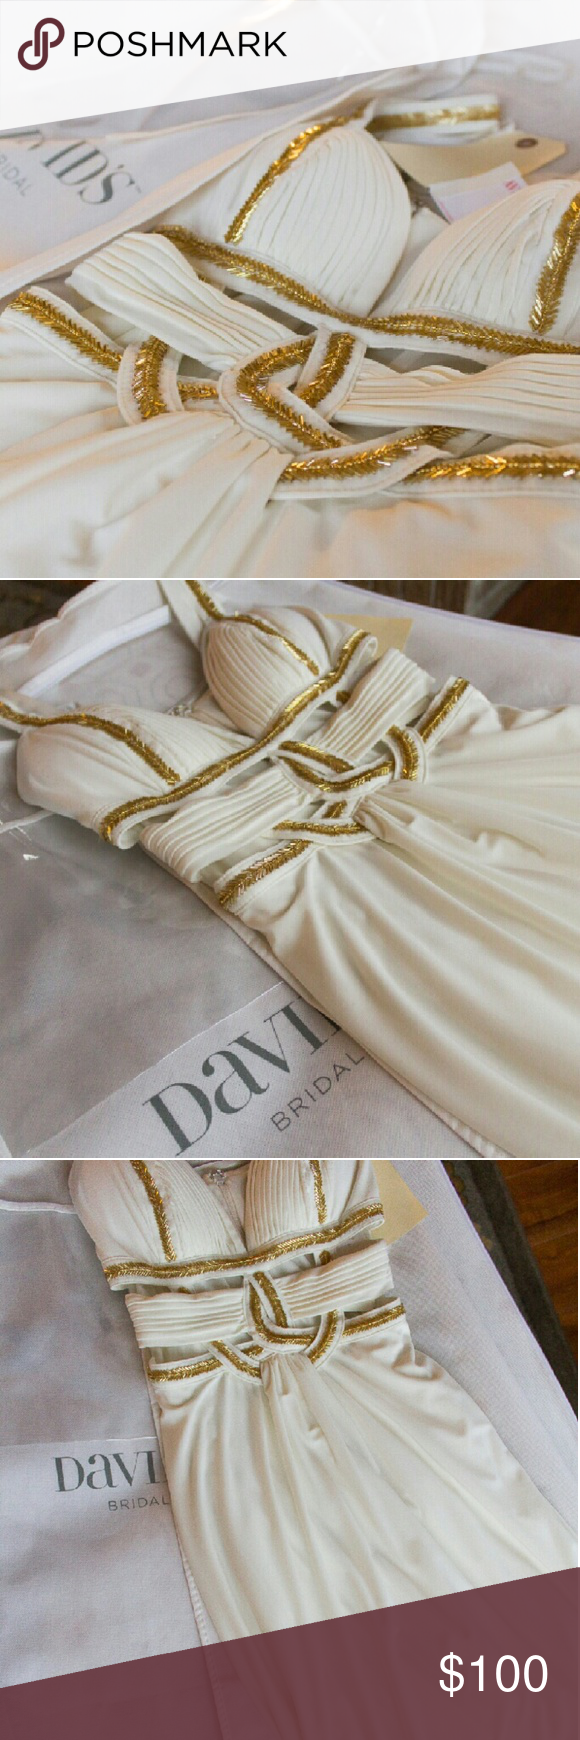 David's Bridal Dress Long sleeveless David's Bridal prom dress with cutouts. Brand new, with tags. Size: 0 Color: Ivory David's Bridal Dresses Prom